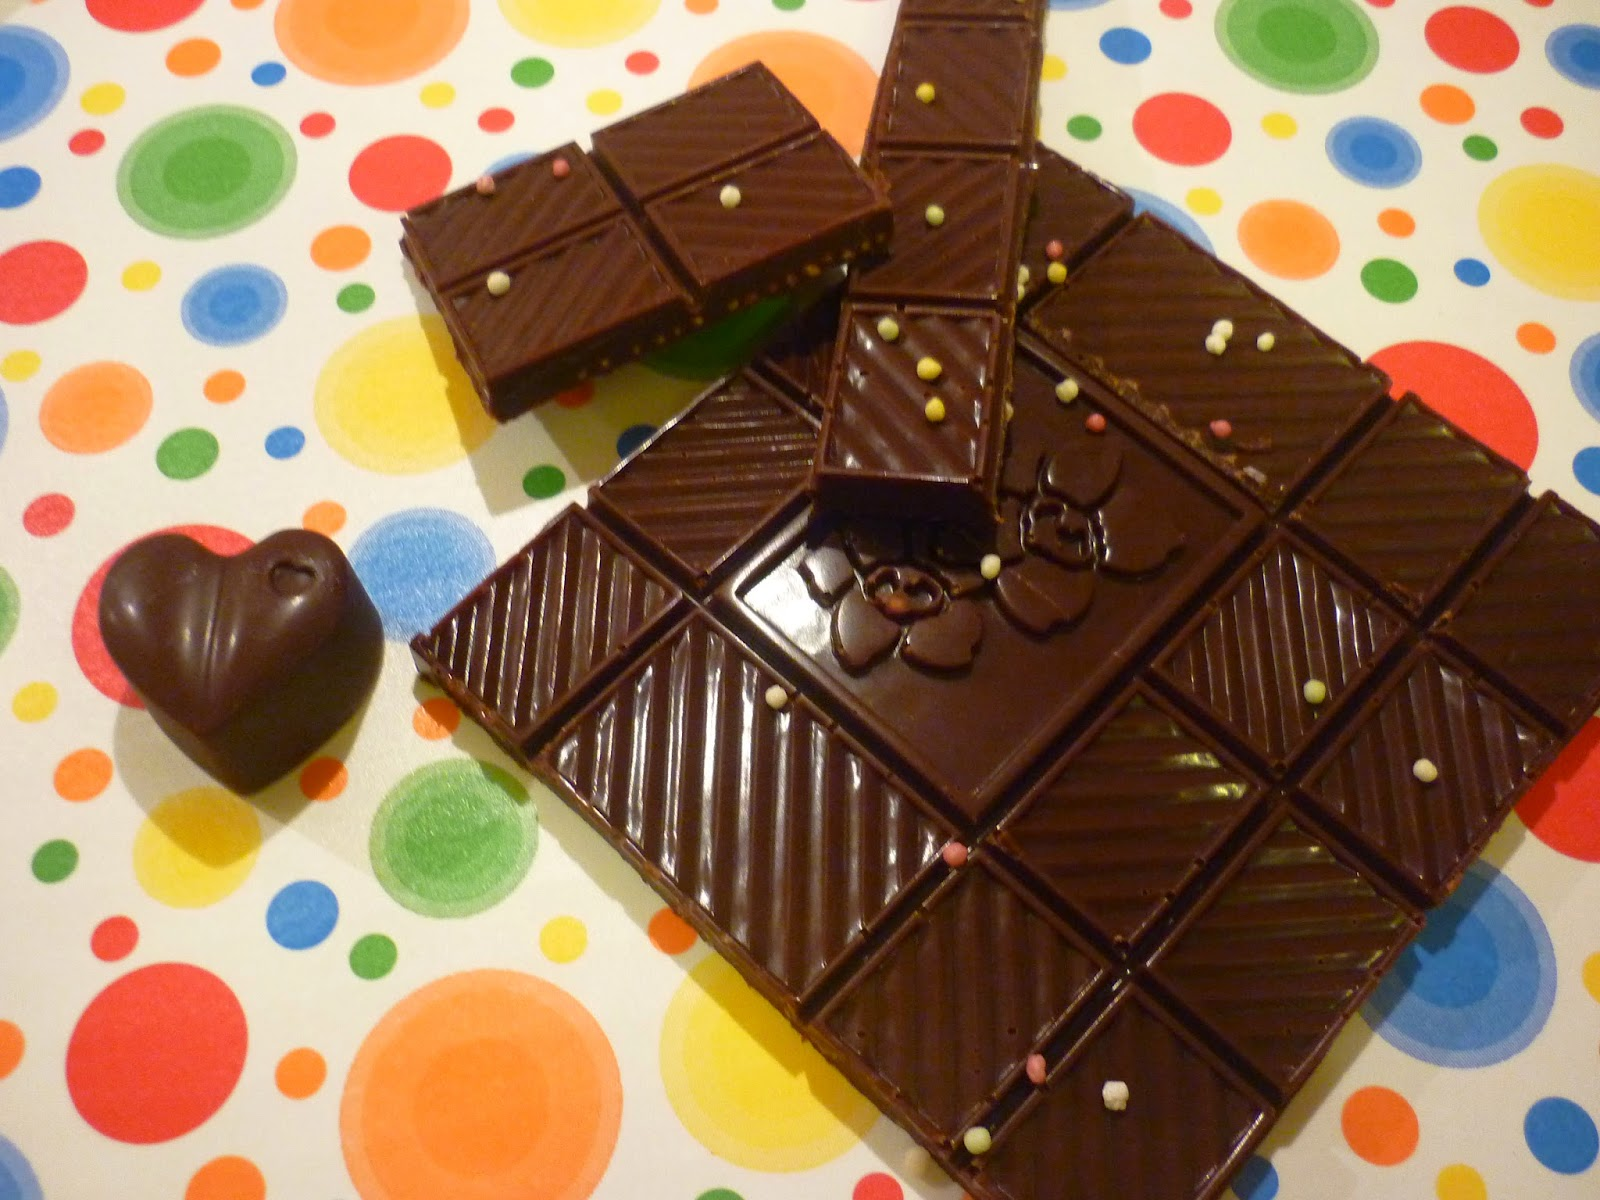 rundumvegan vegane schokolade selber machen. Black Bedroom Furniture Sets. Home Design Ideas